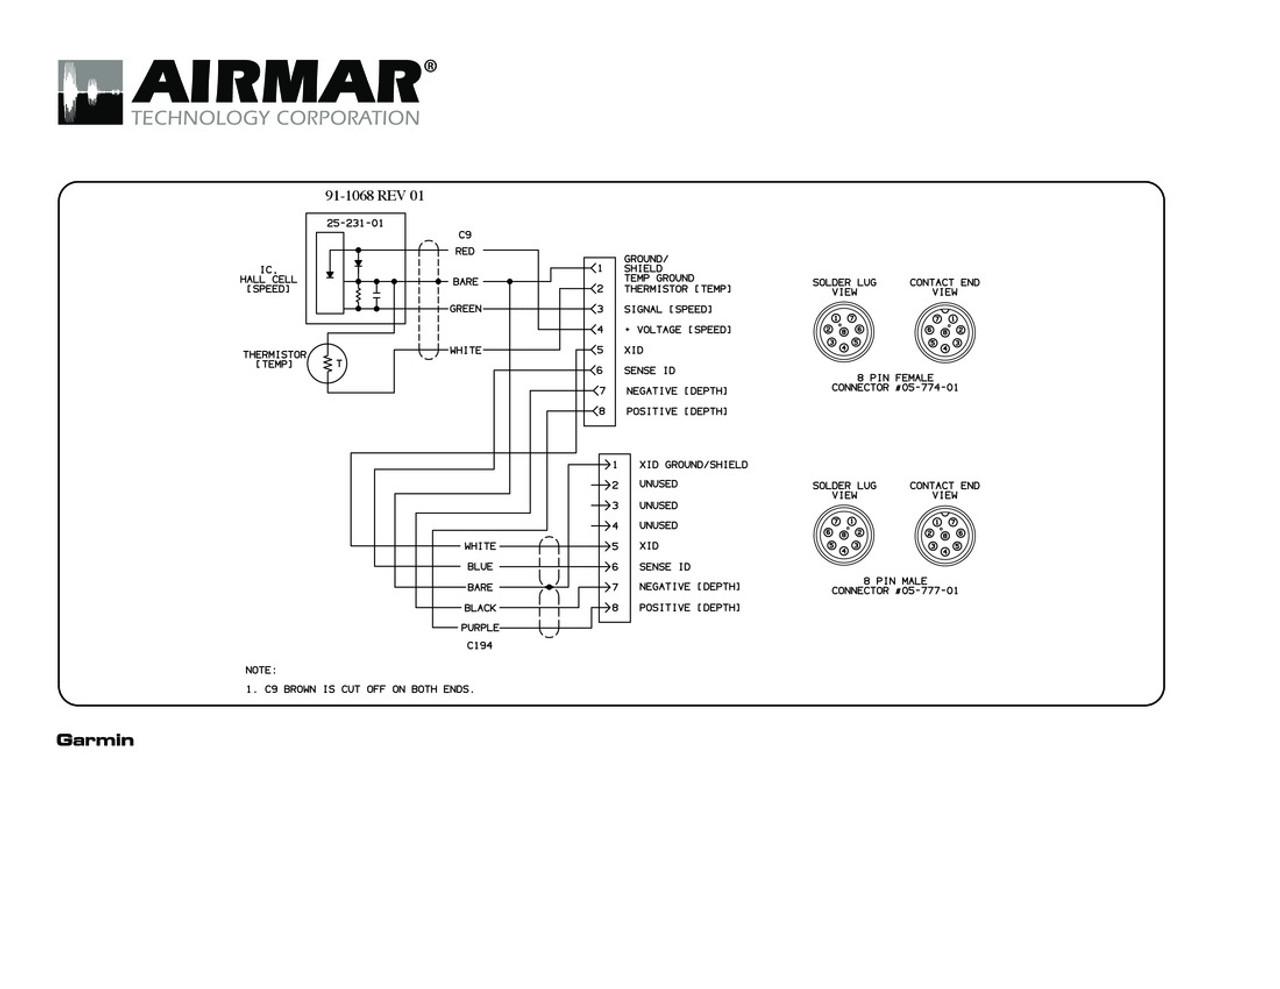 small resolution of airmar wiring diagram garmin st850 8 pin s t blue bottle marine 4 pin din plug garmin 4 pin wiring diagram